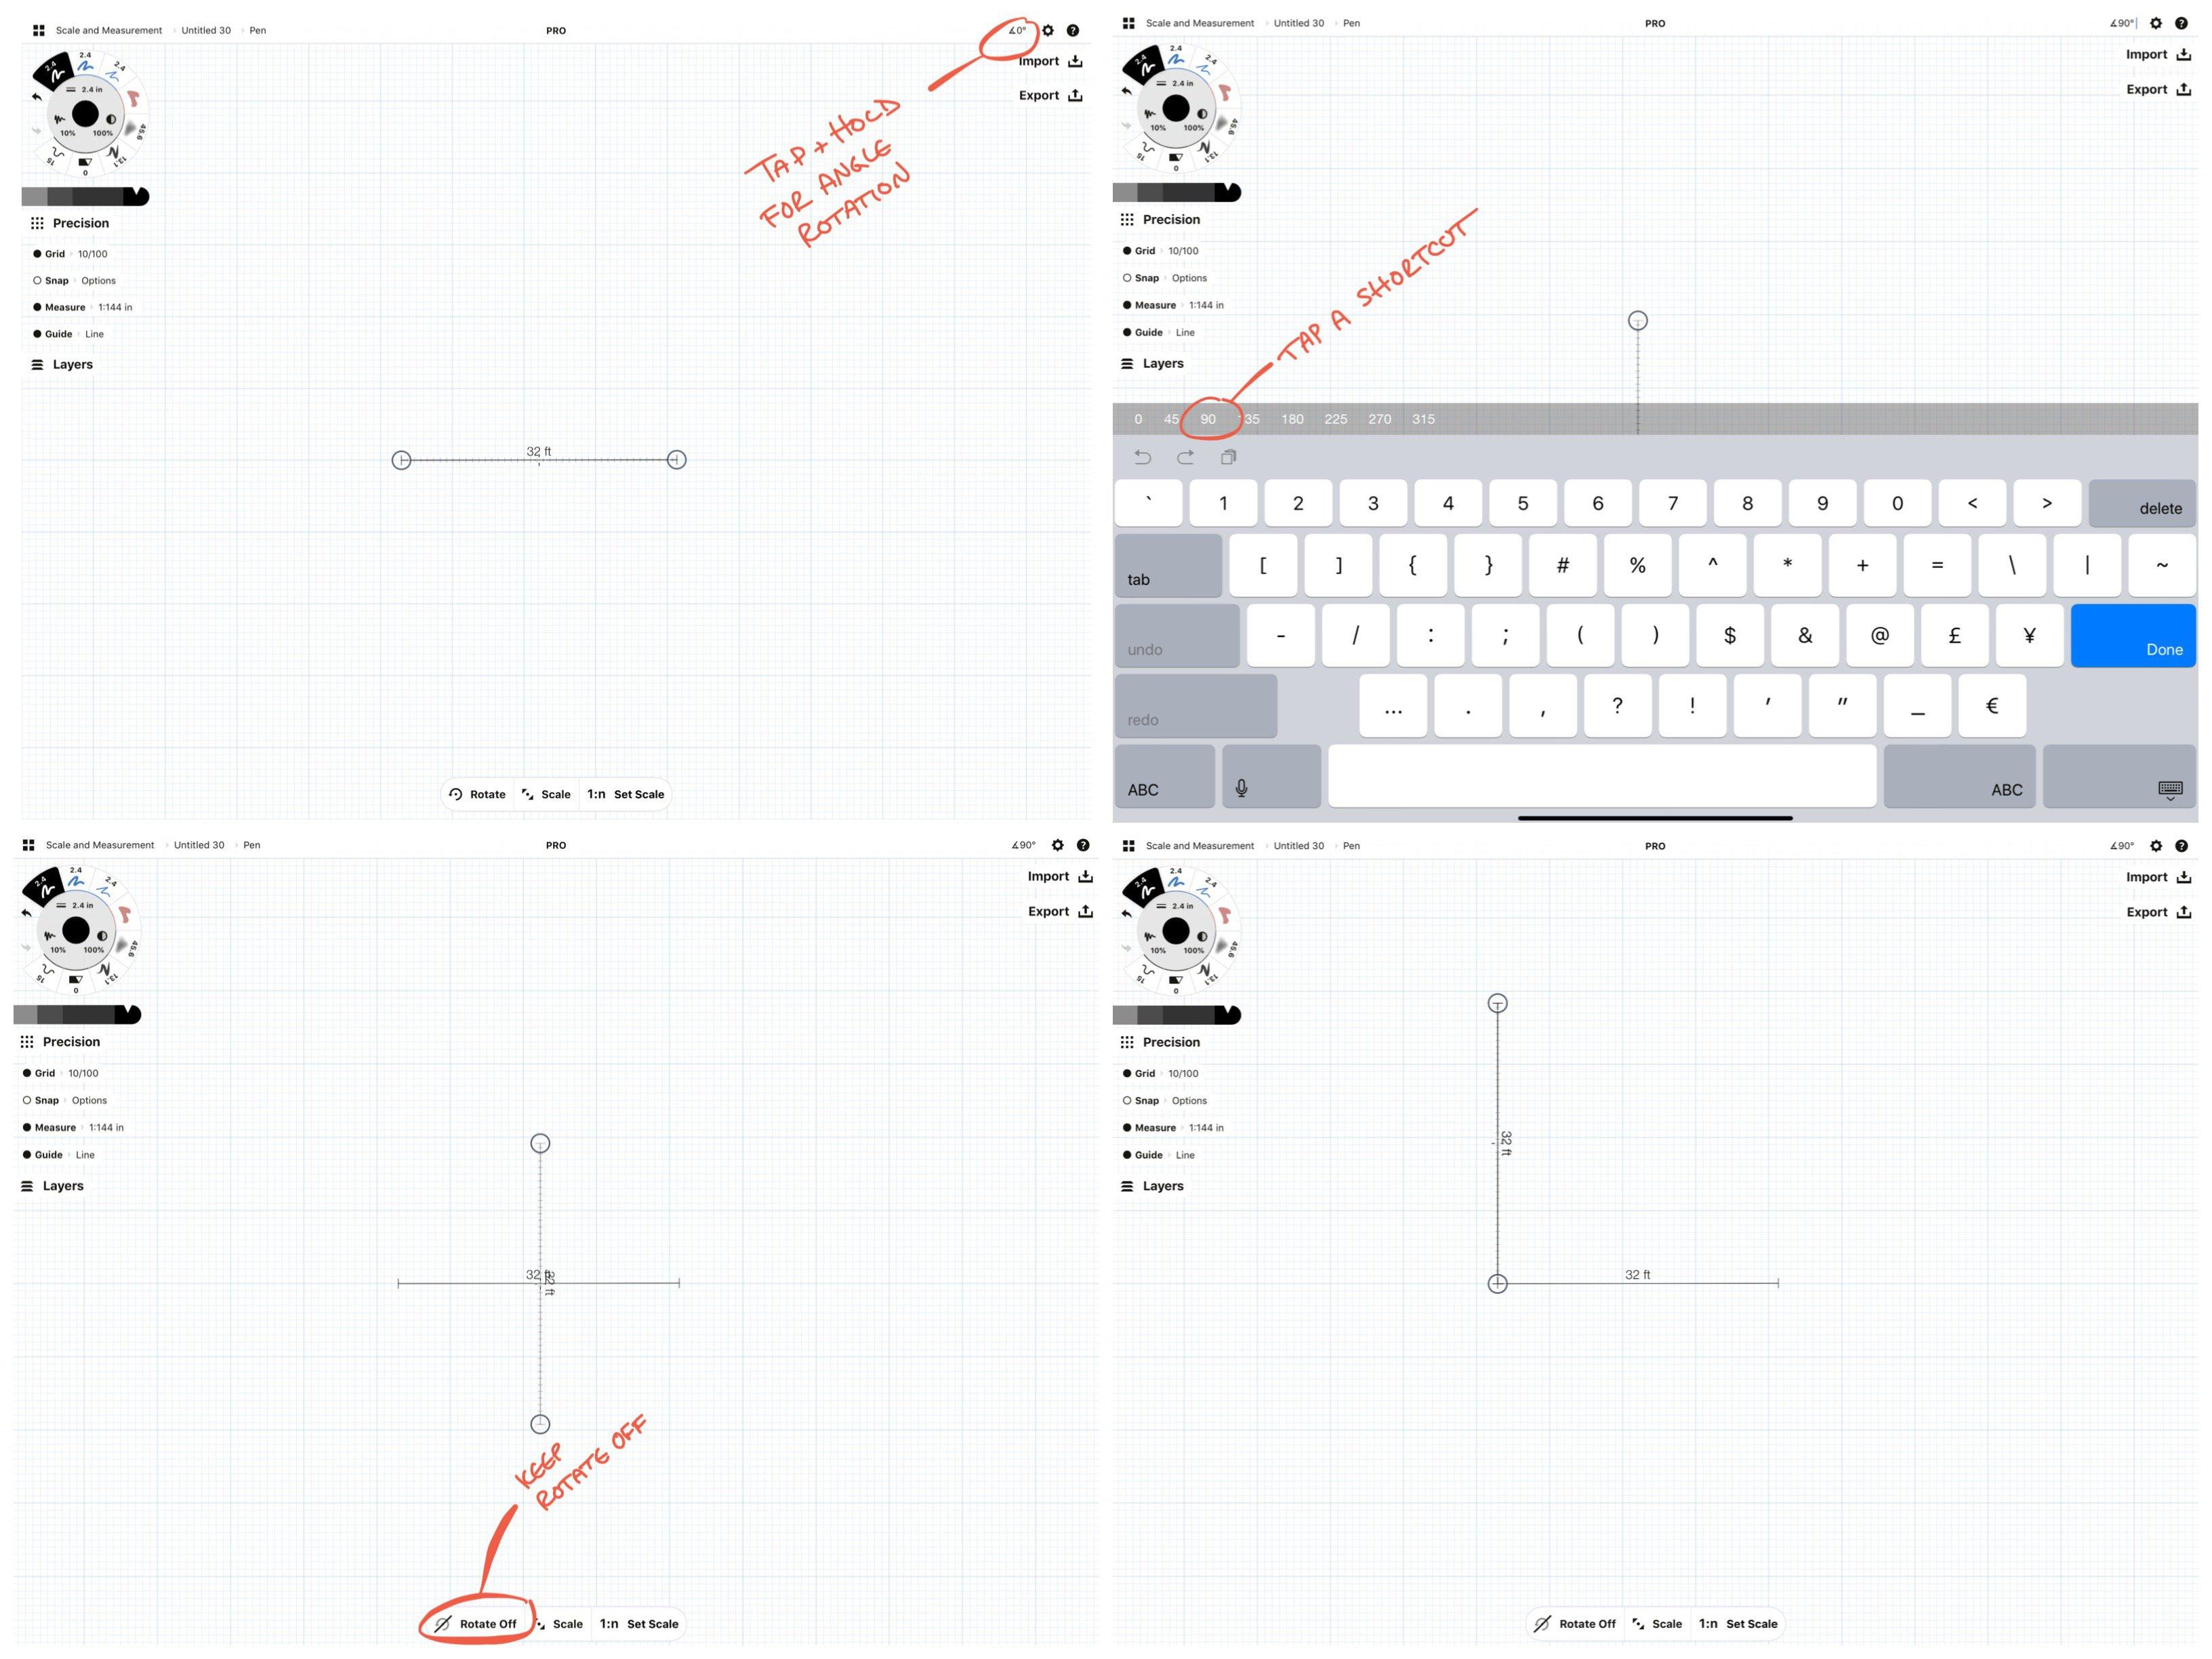 floorplan_new_angle.JPG